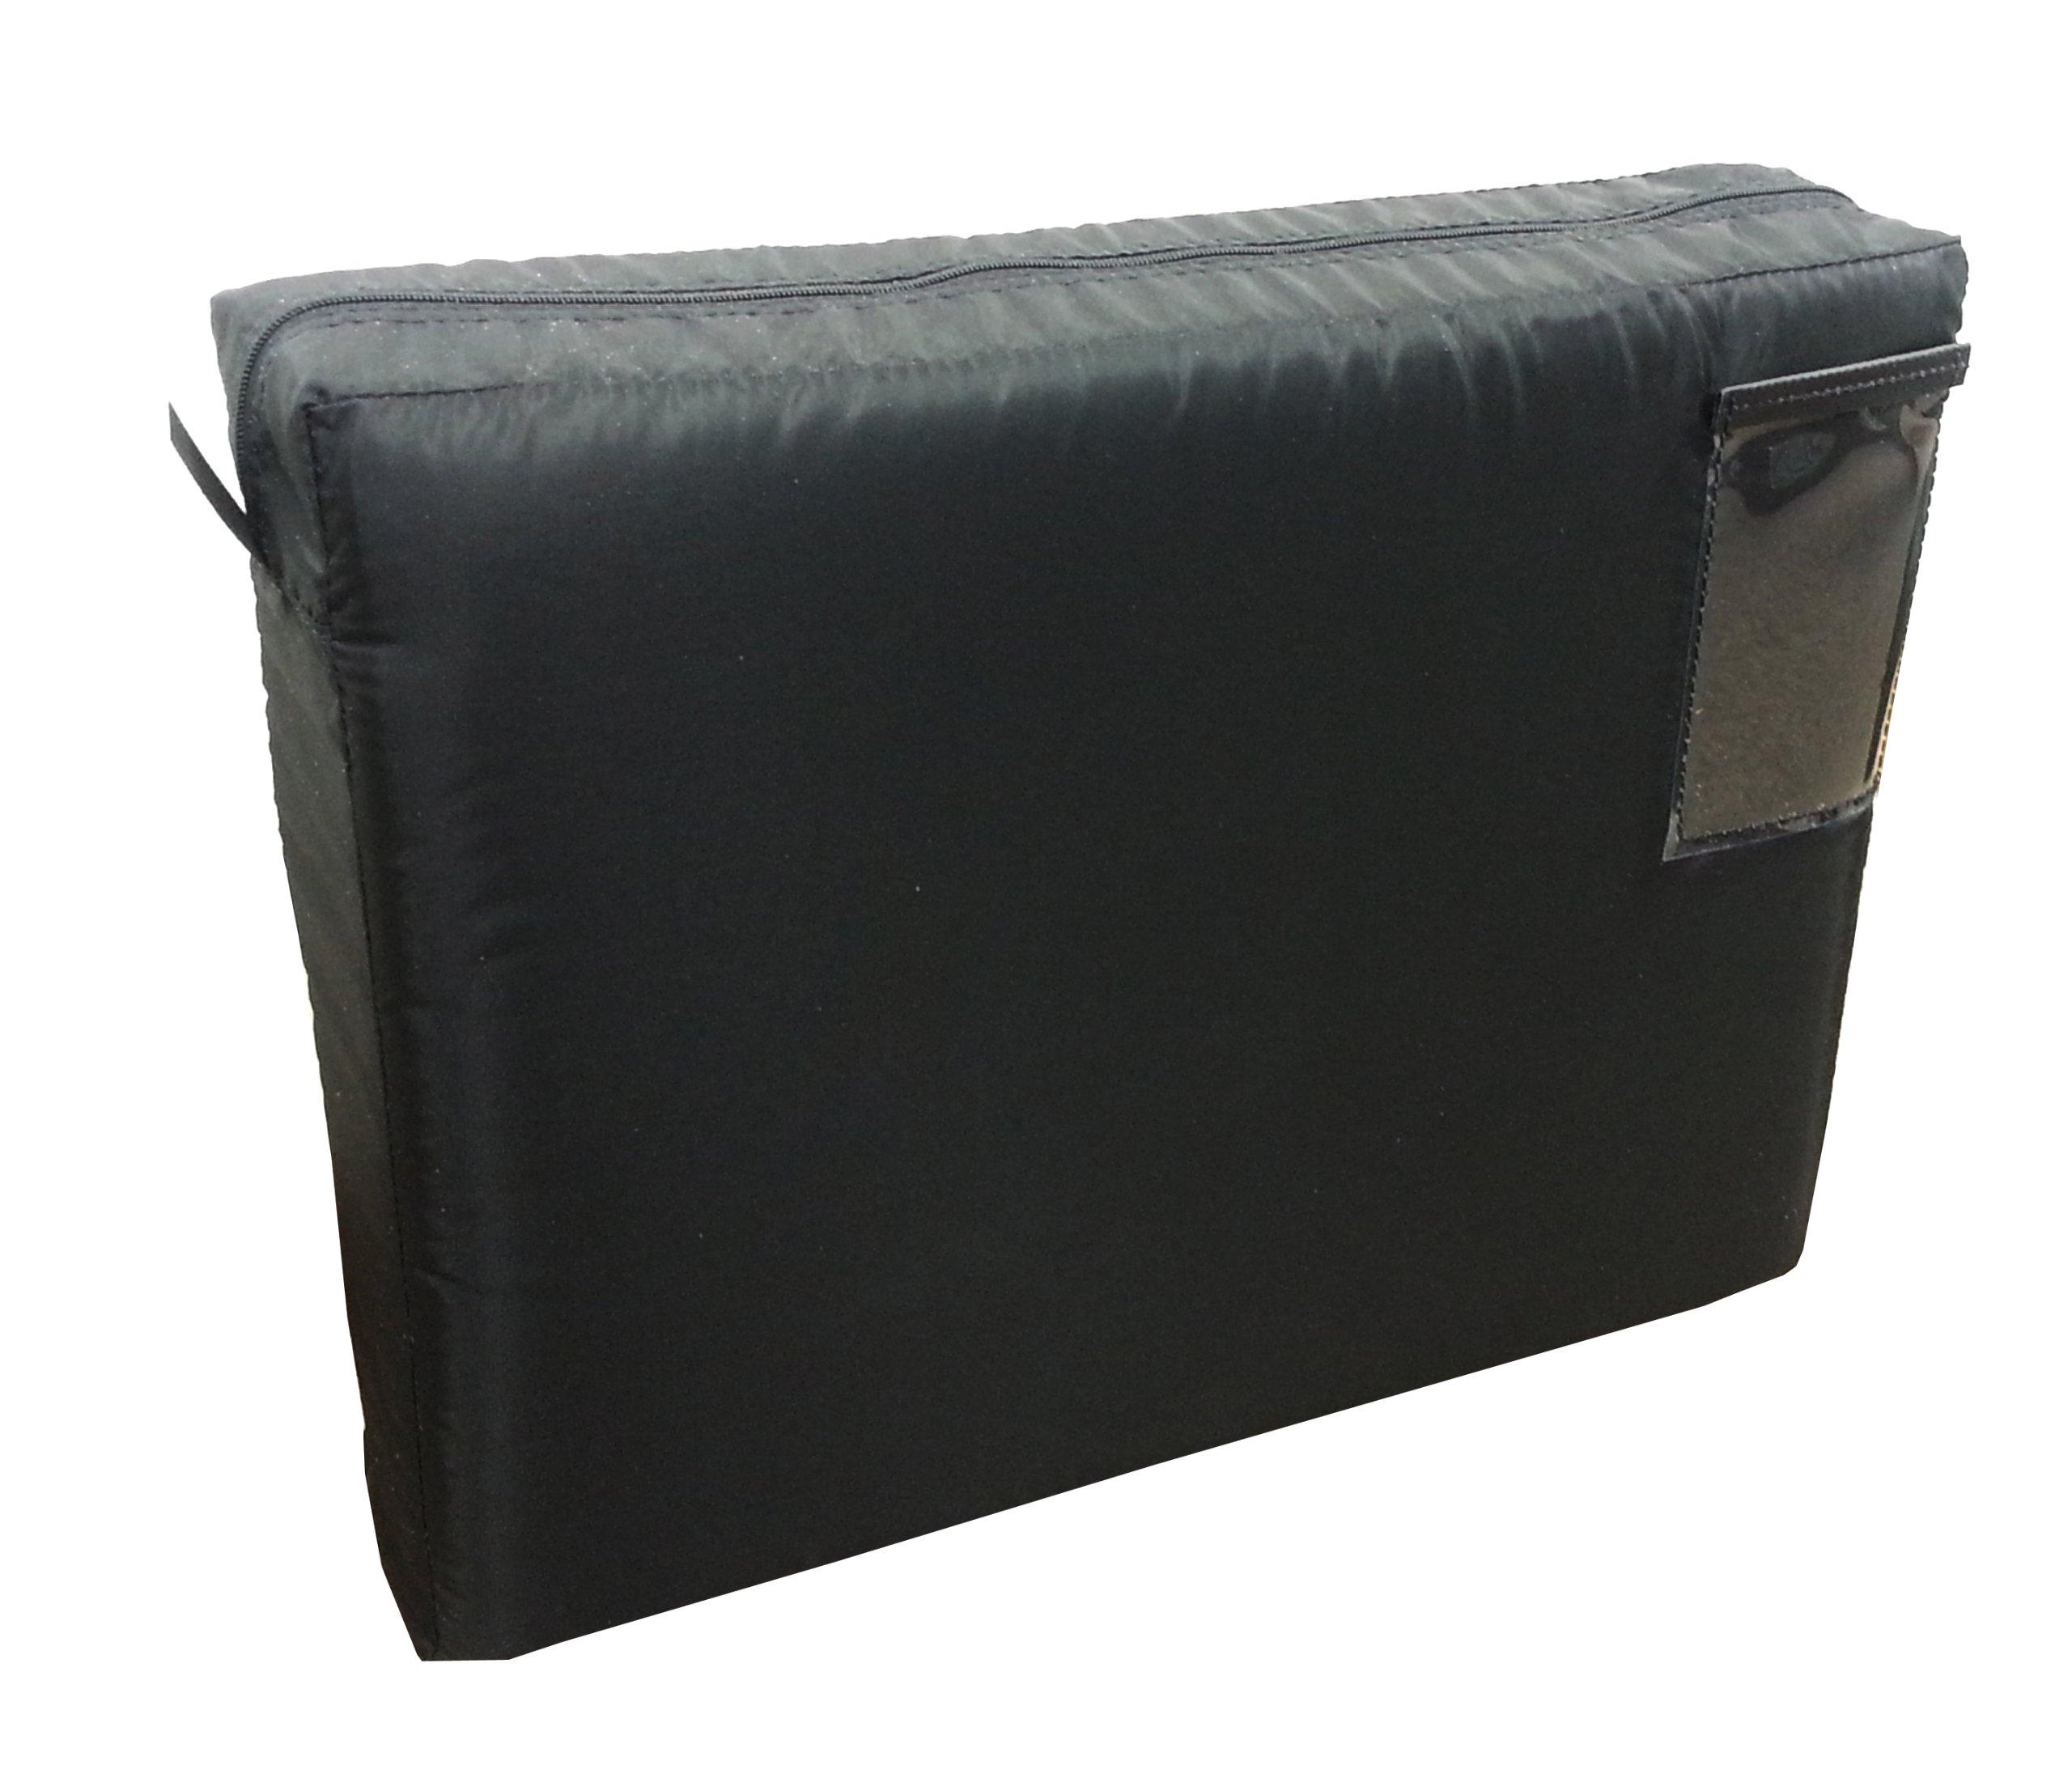 Mailer Transit Sack Expandable Interoffice Mailbag 18w x 14h x 4d Black by Cardinal bag supplies